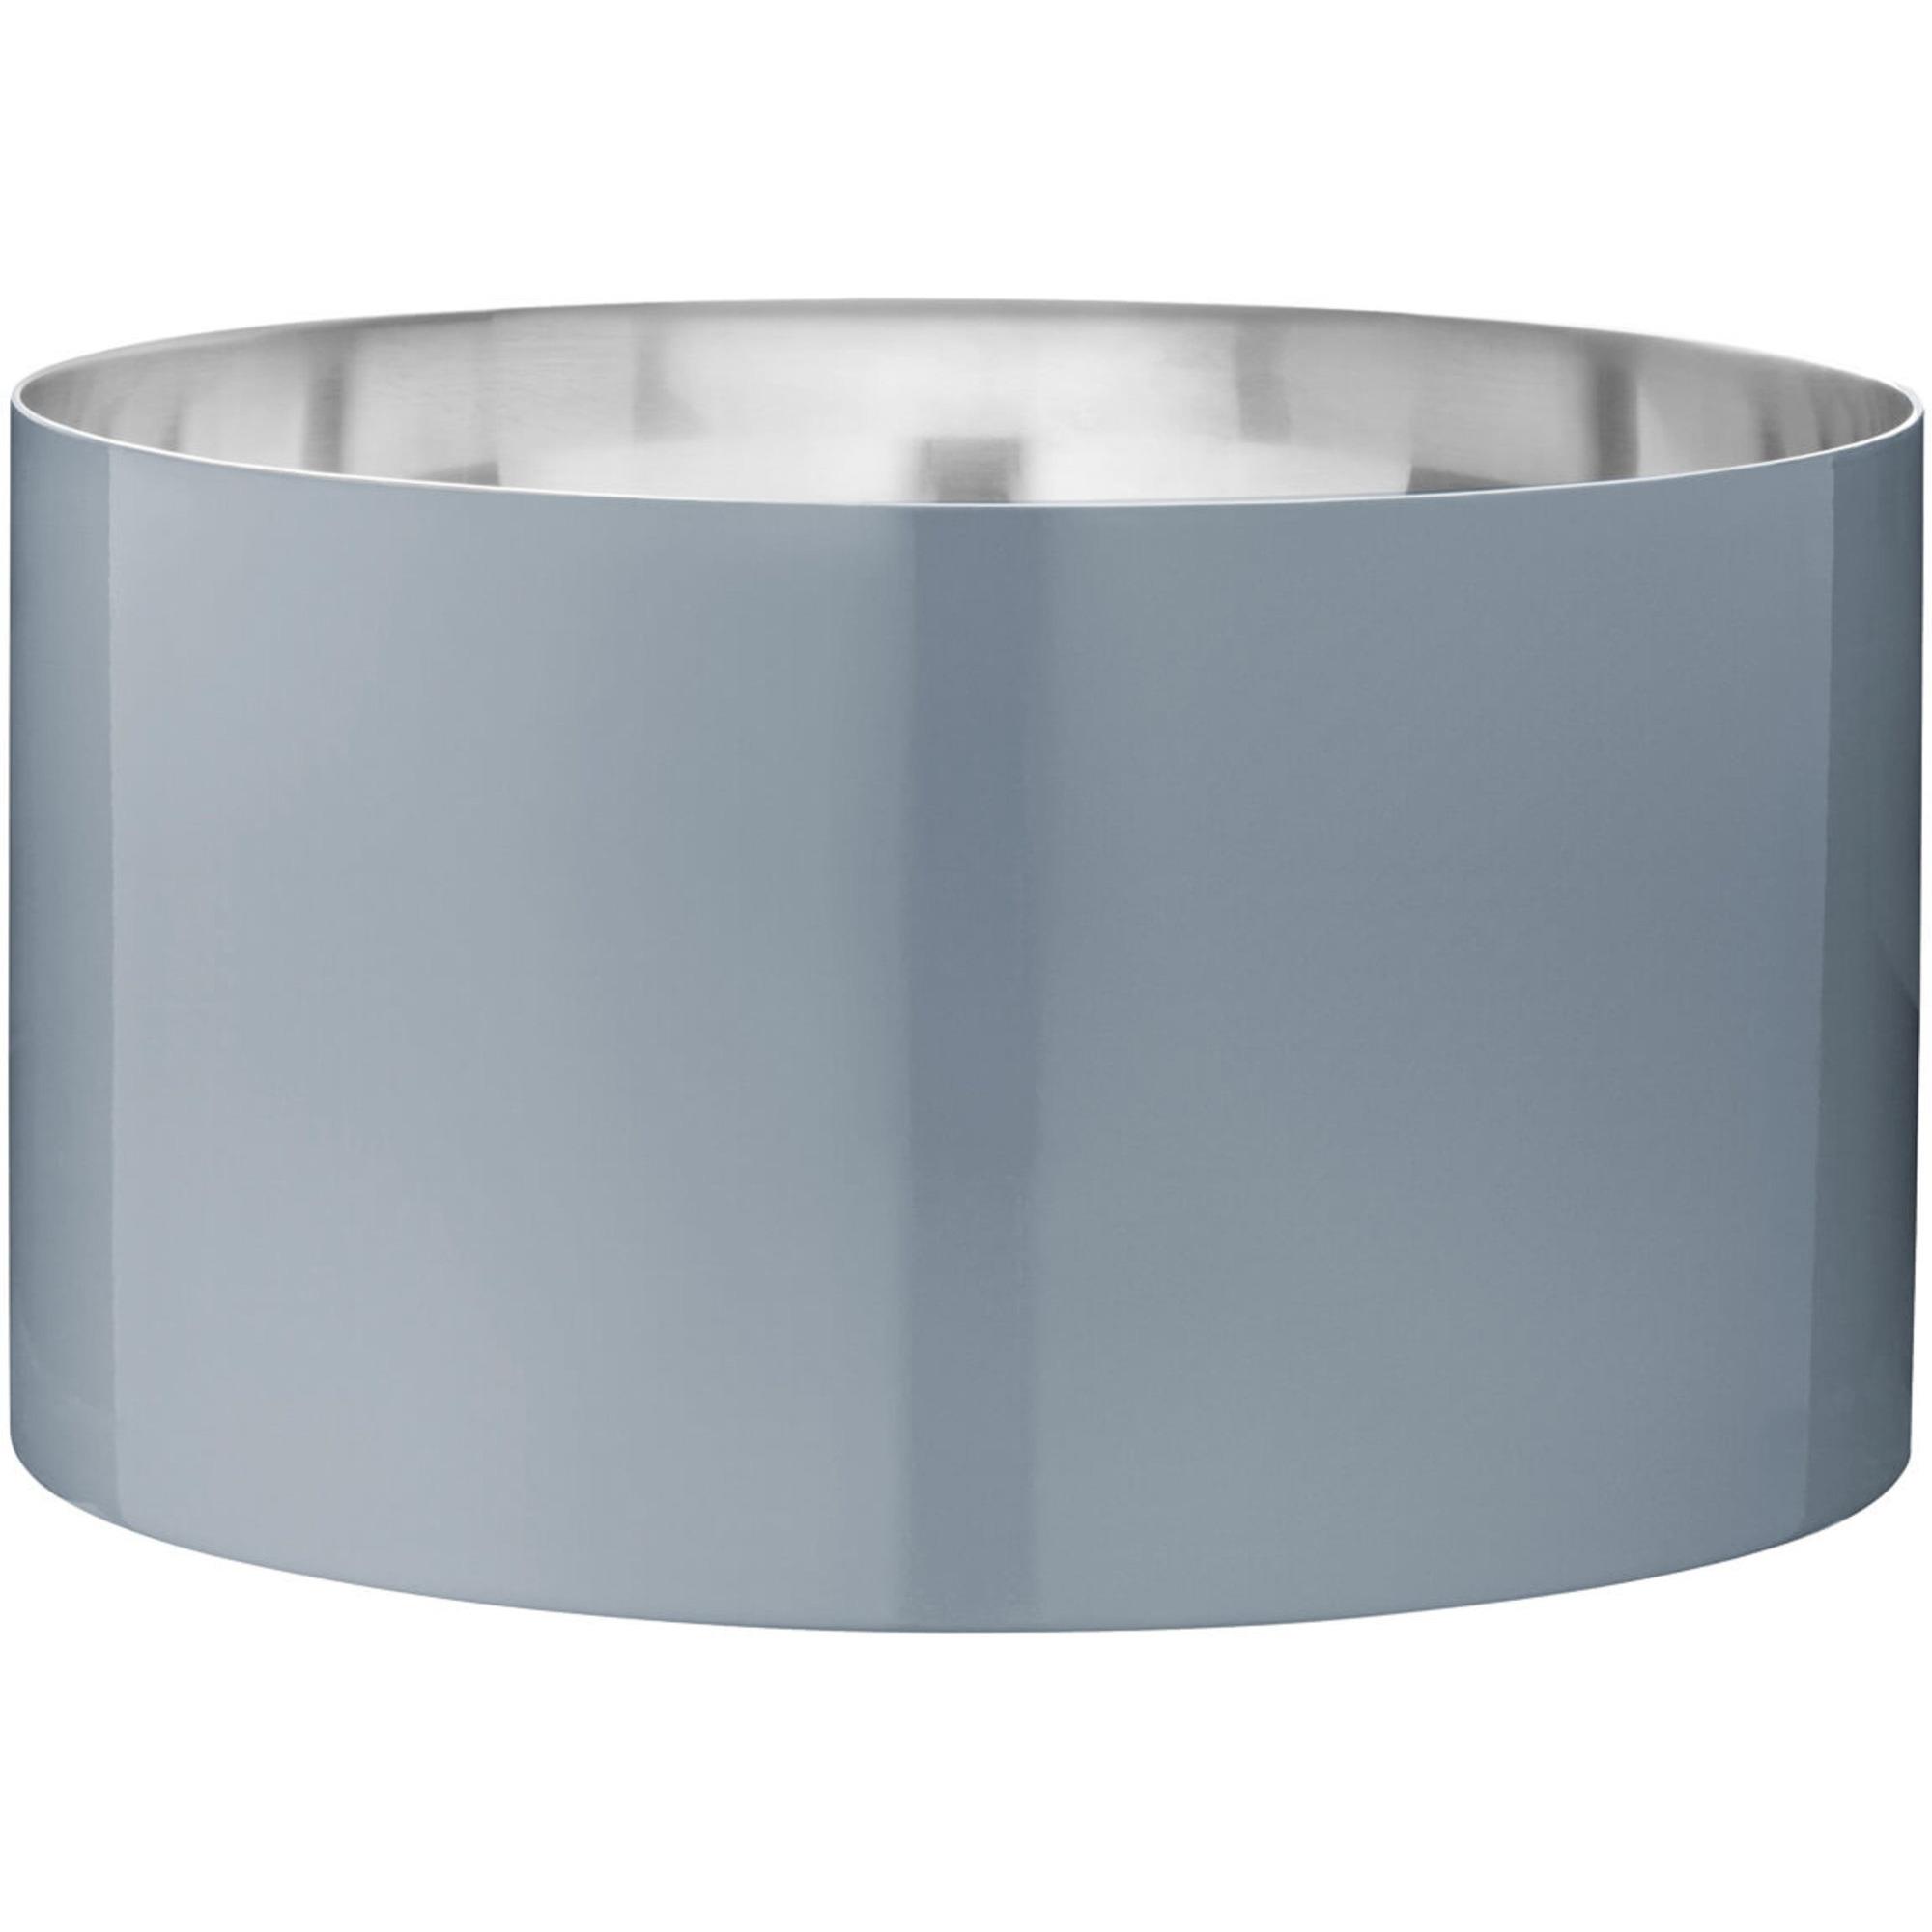 Stelton Cylinda-line 50 års Jubileum Salladsskål24 cm Smokey Blue